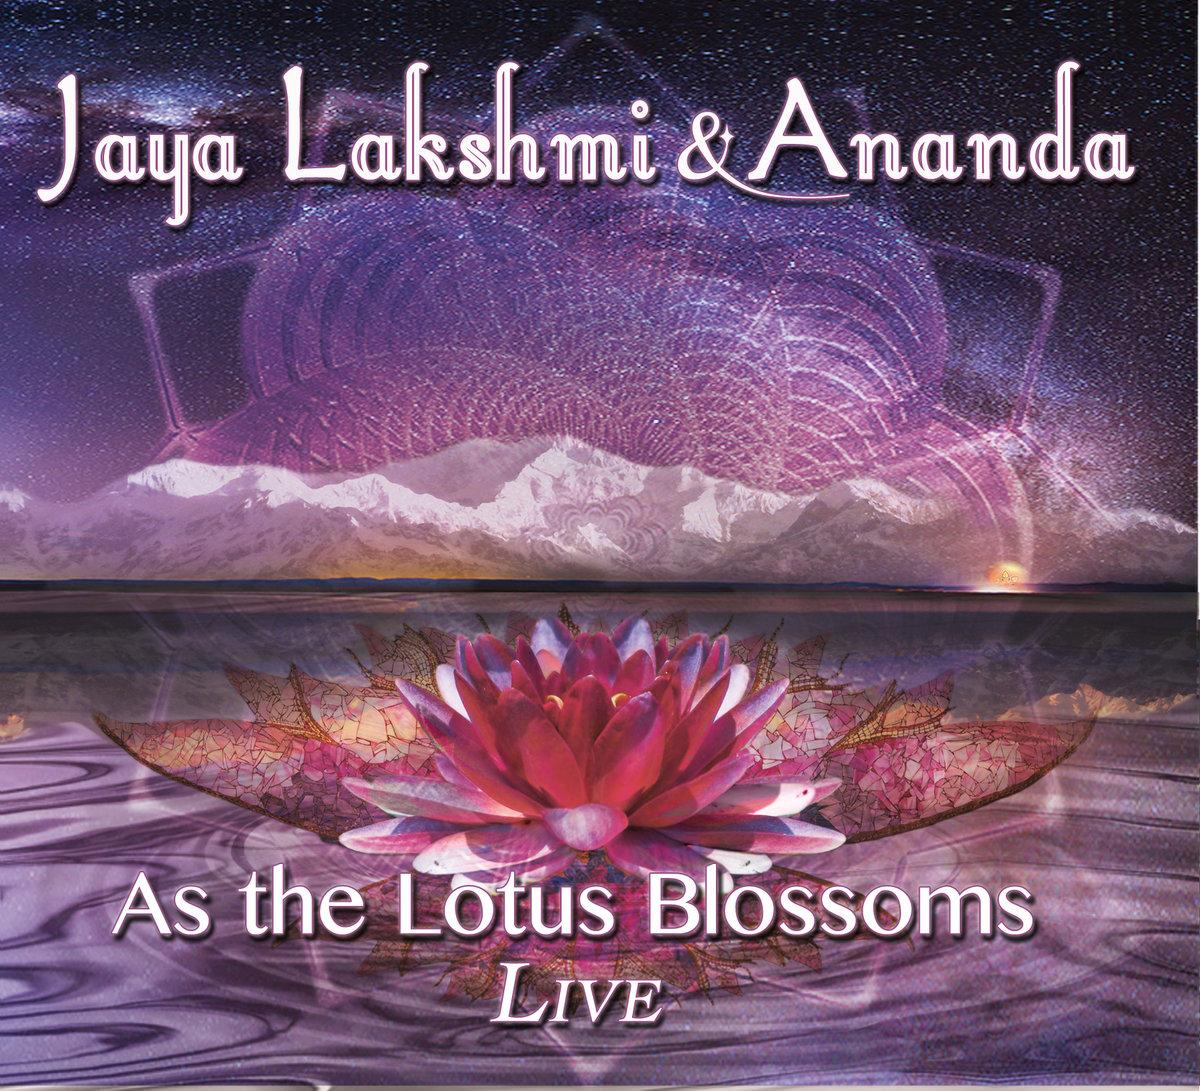 Maha Mantra Jaya Lakshmi And Ananda